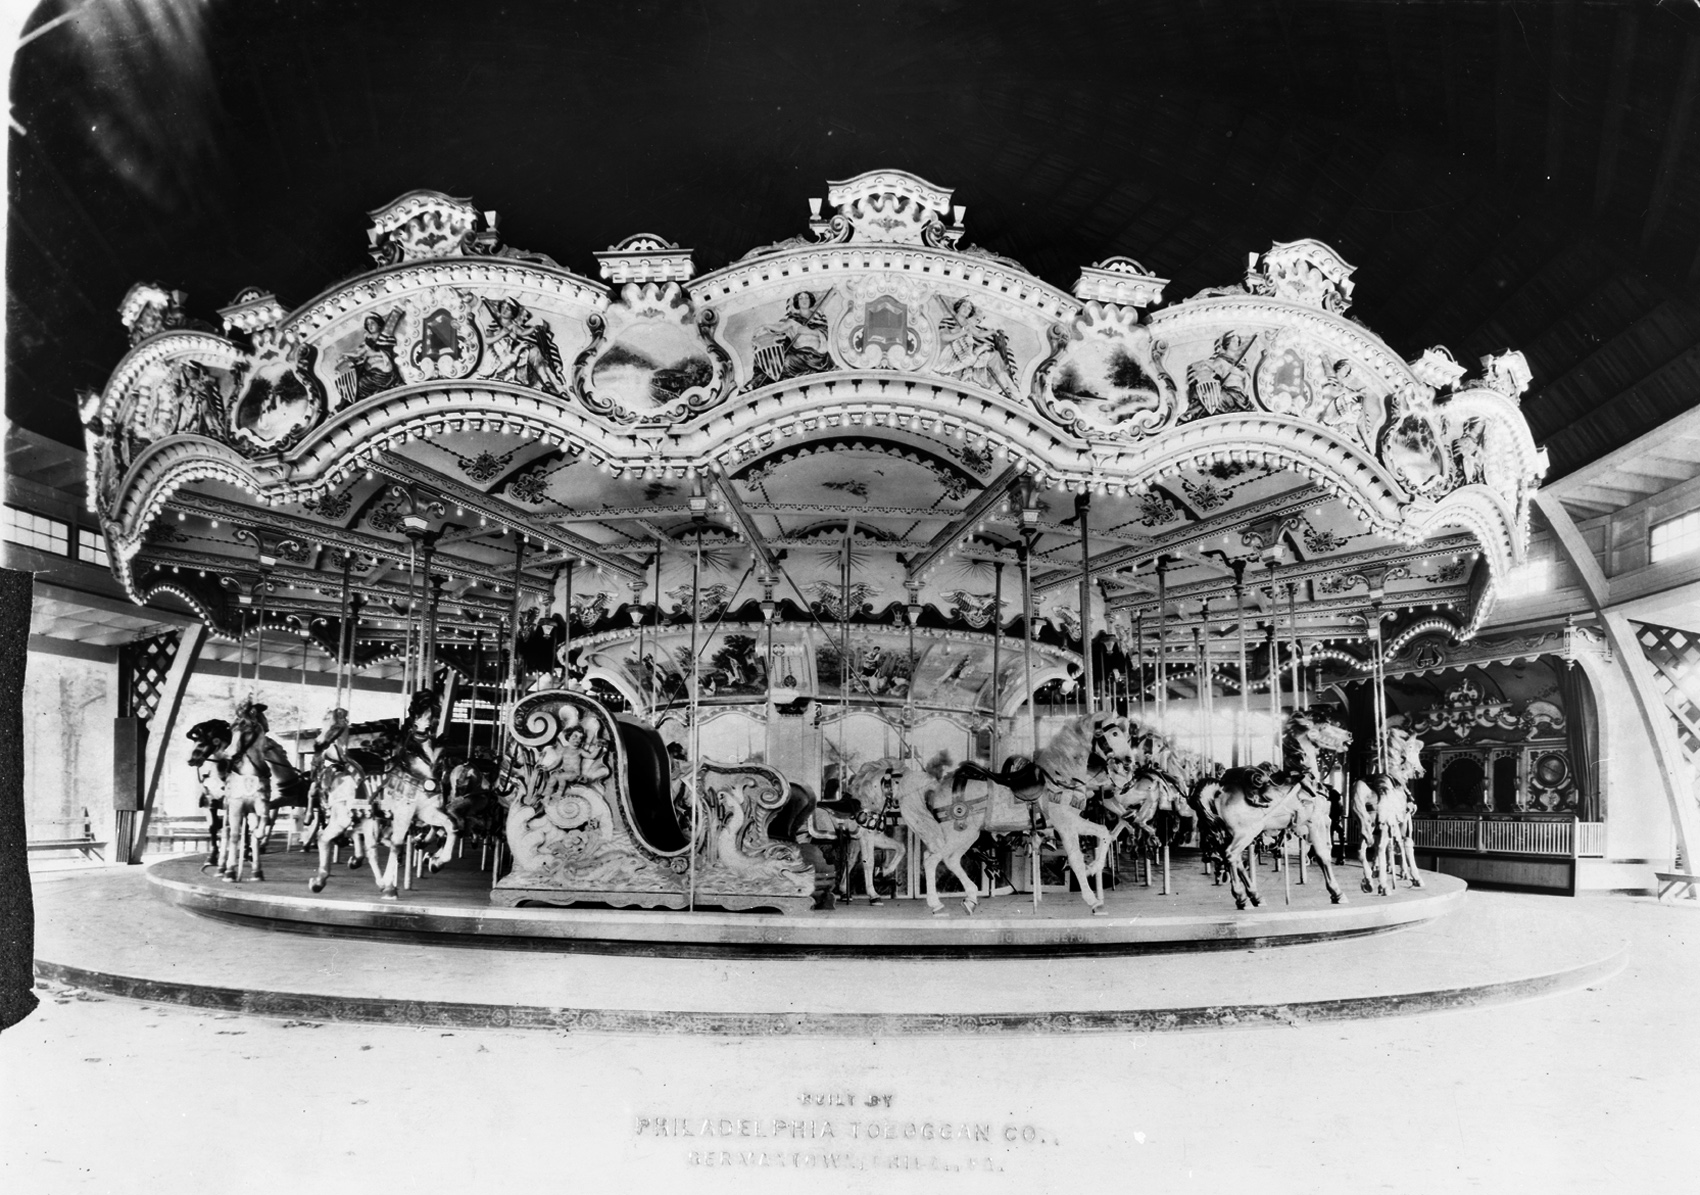 Philadelphia-Toboggan-Co-1919-PTC-No-47-carousel-Hersheypark